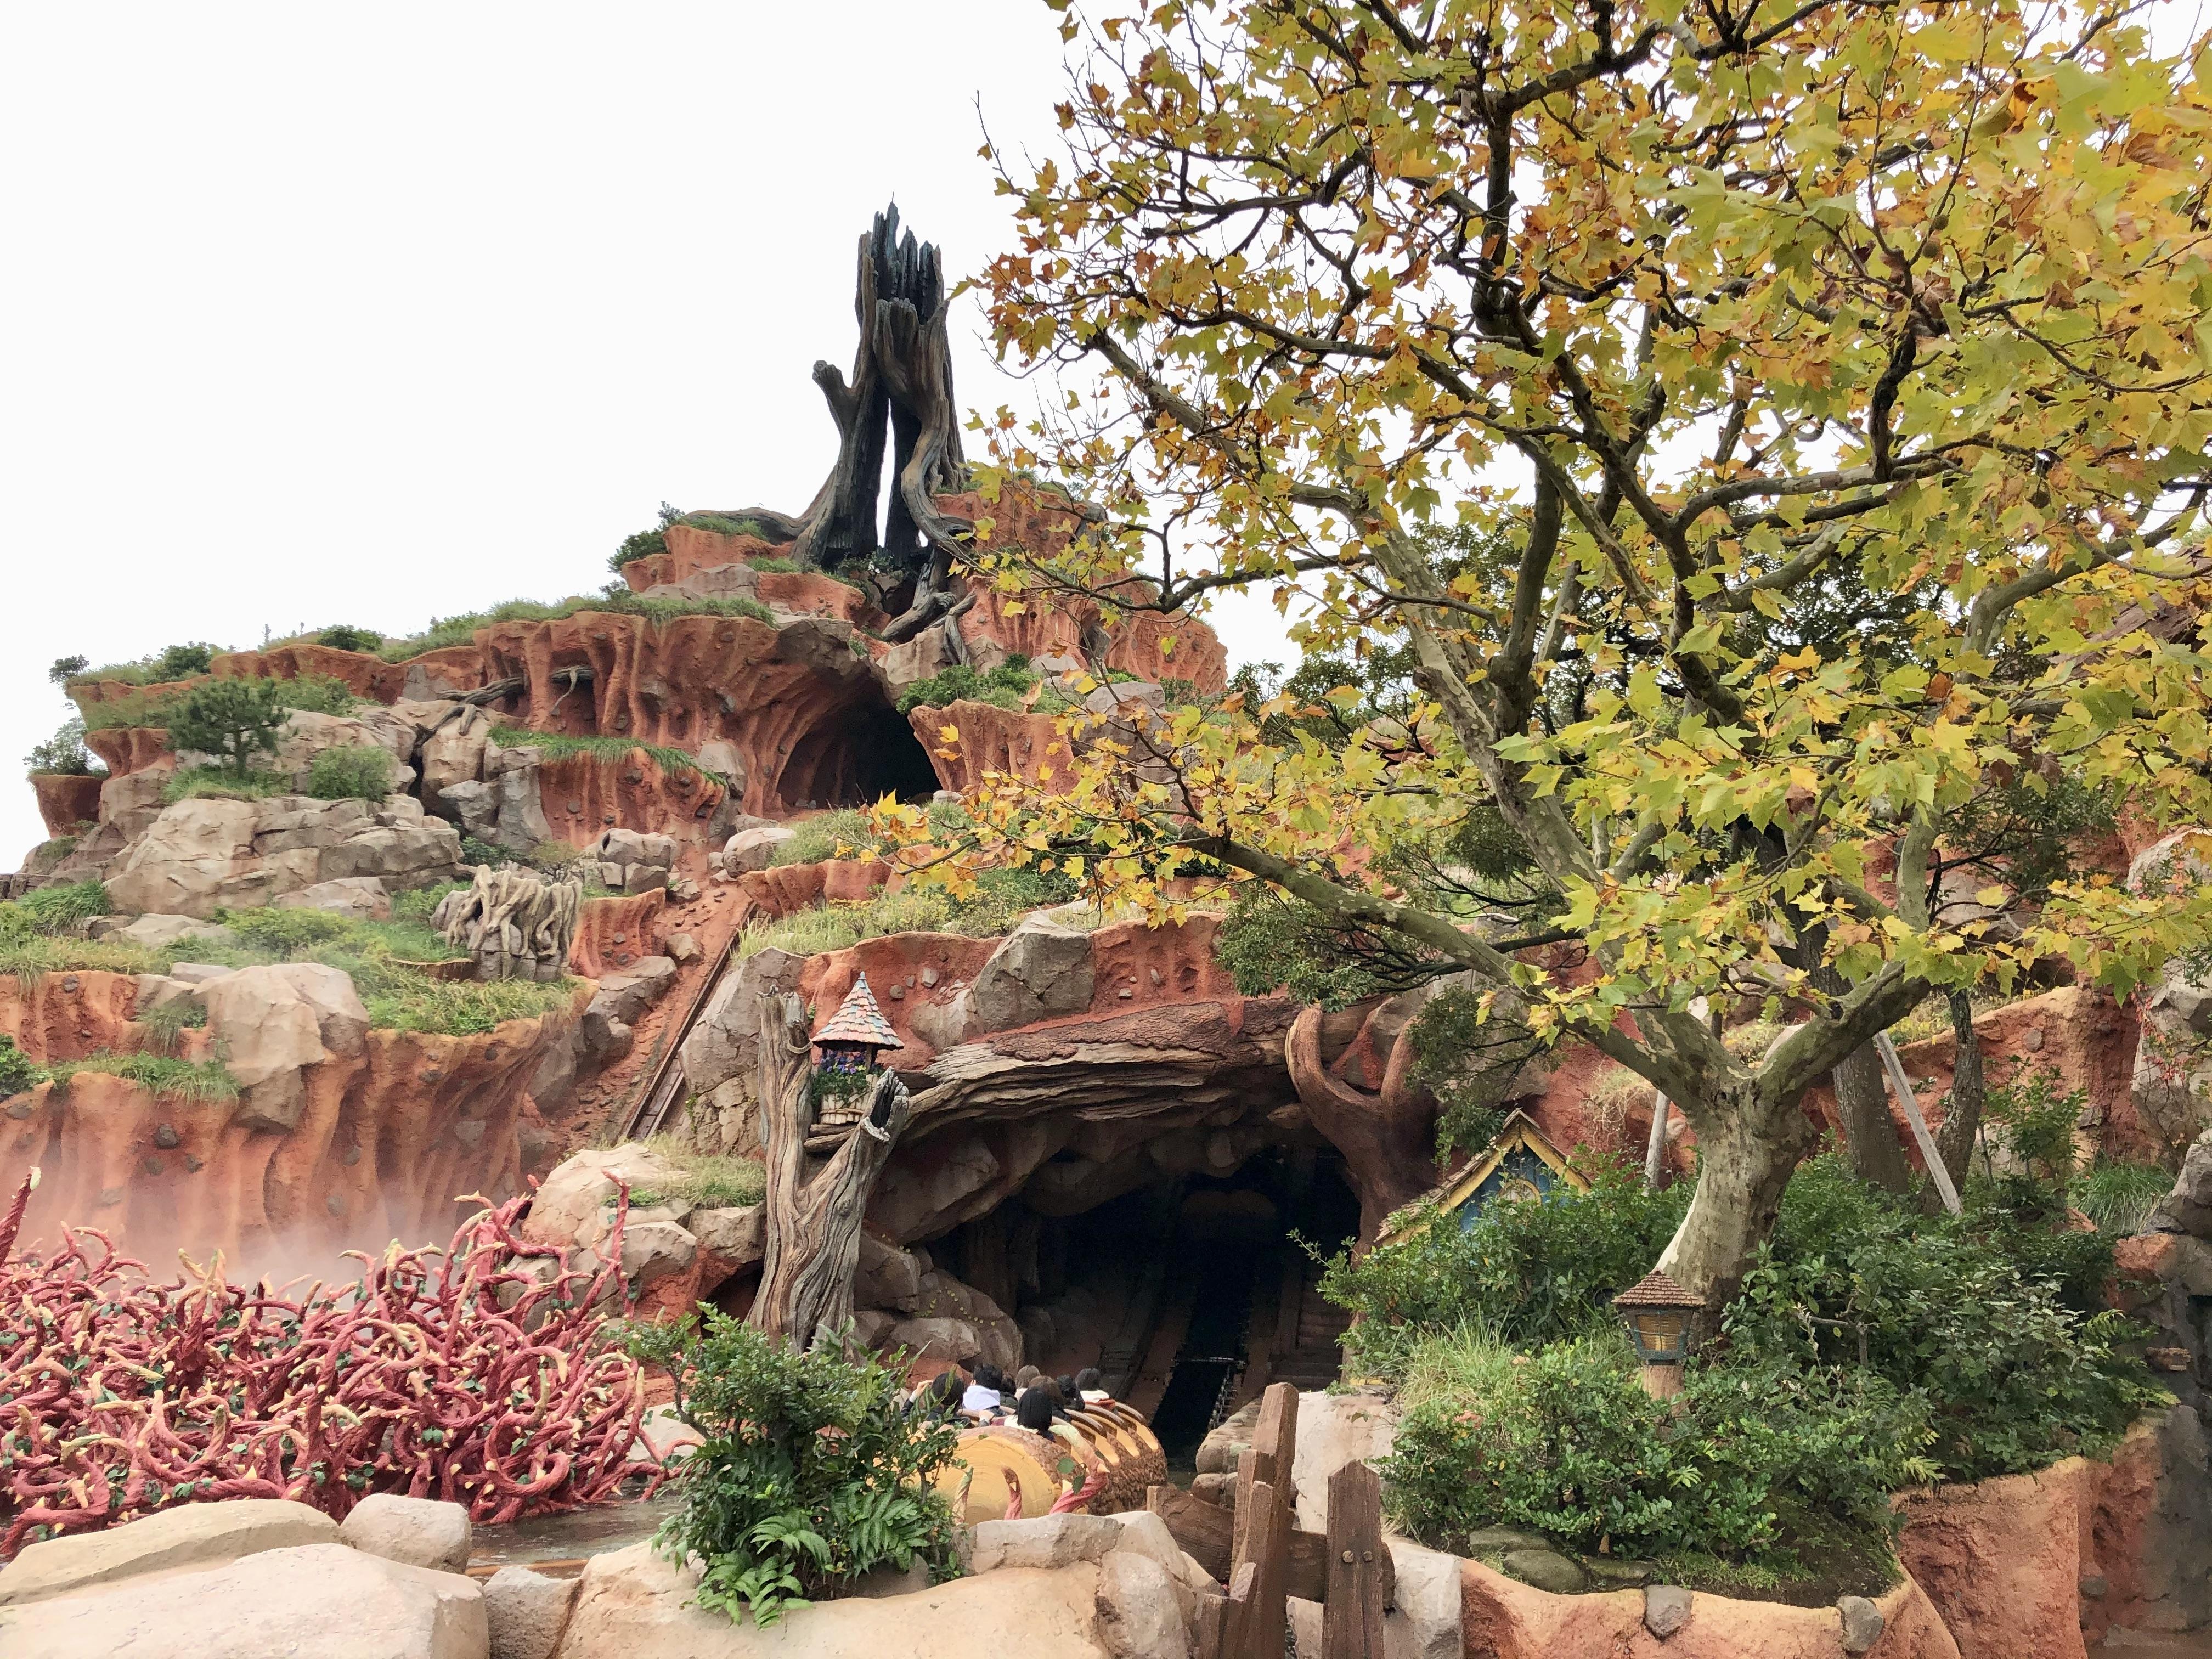 021-Tokyo-Disneyland-Splash-Mountain-Autumn-Leaves-by-Joshua-Meyer